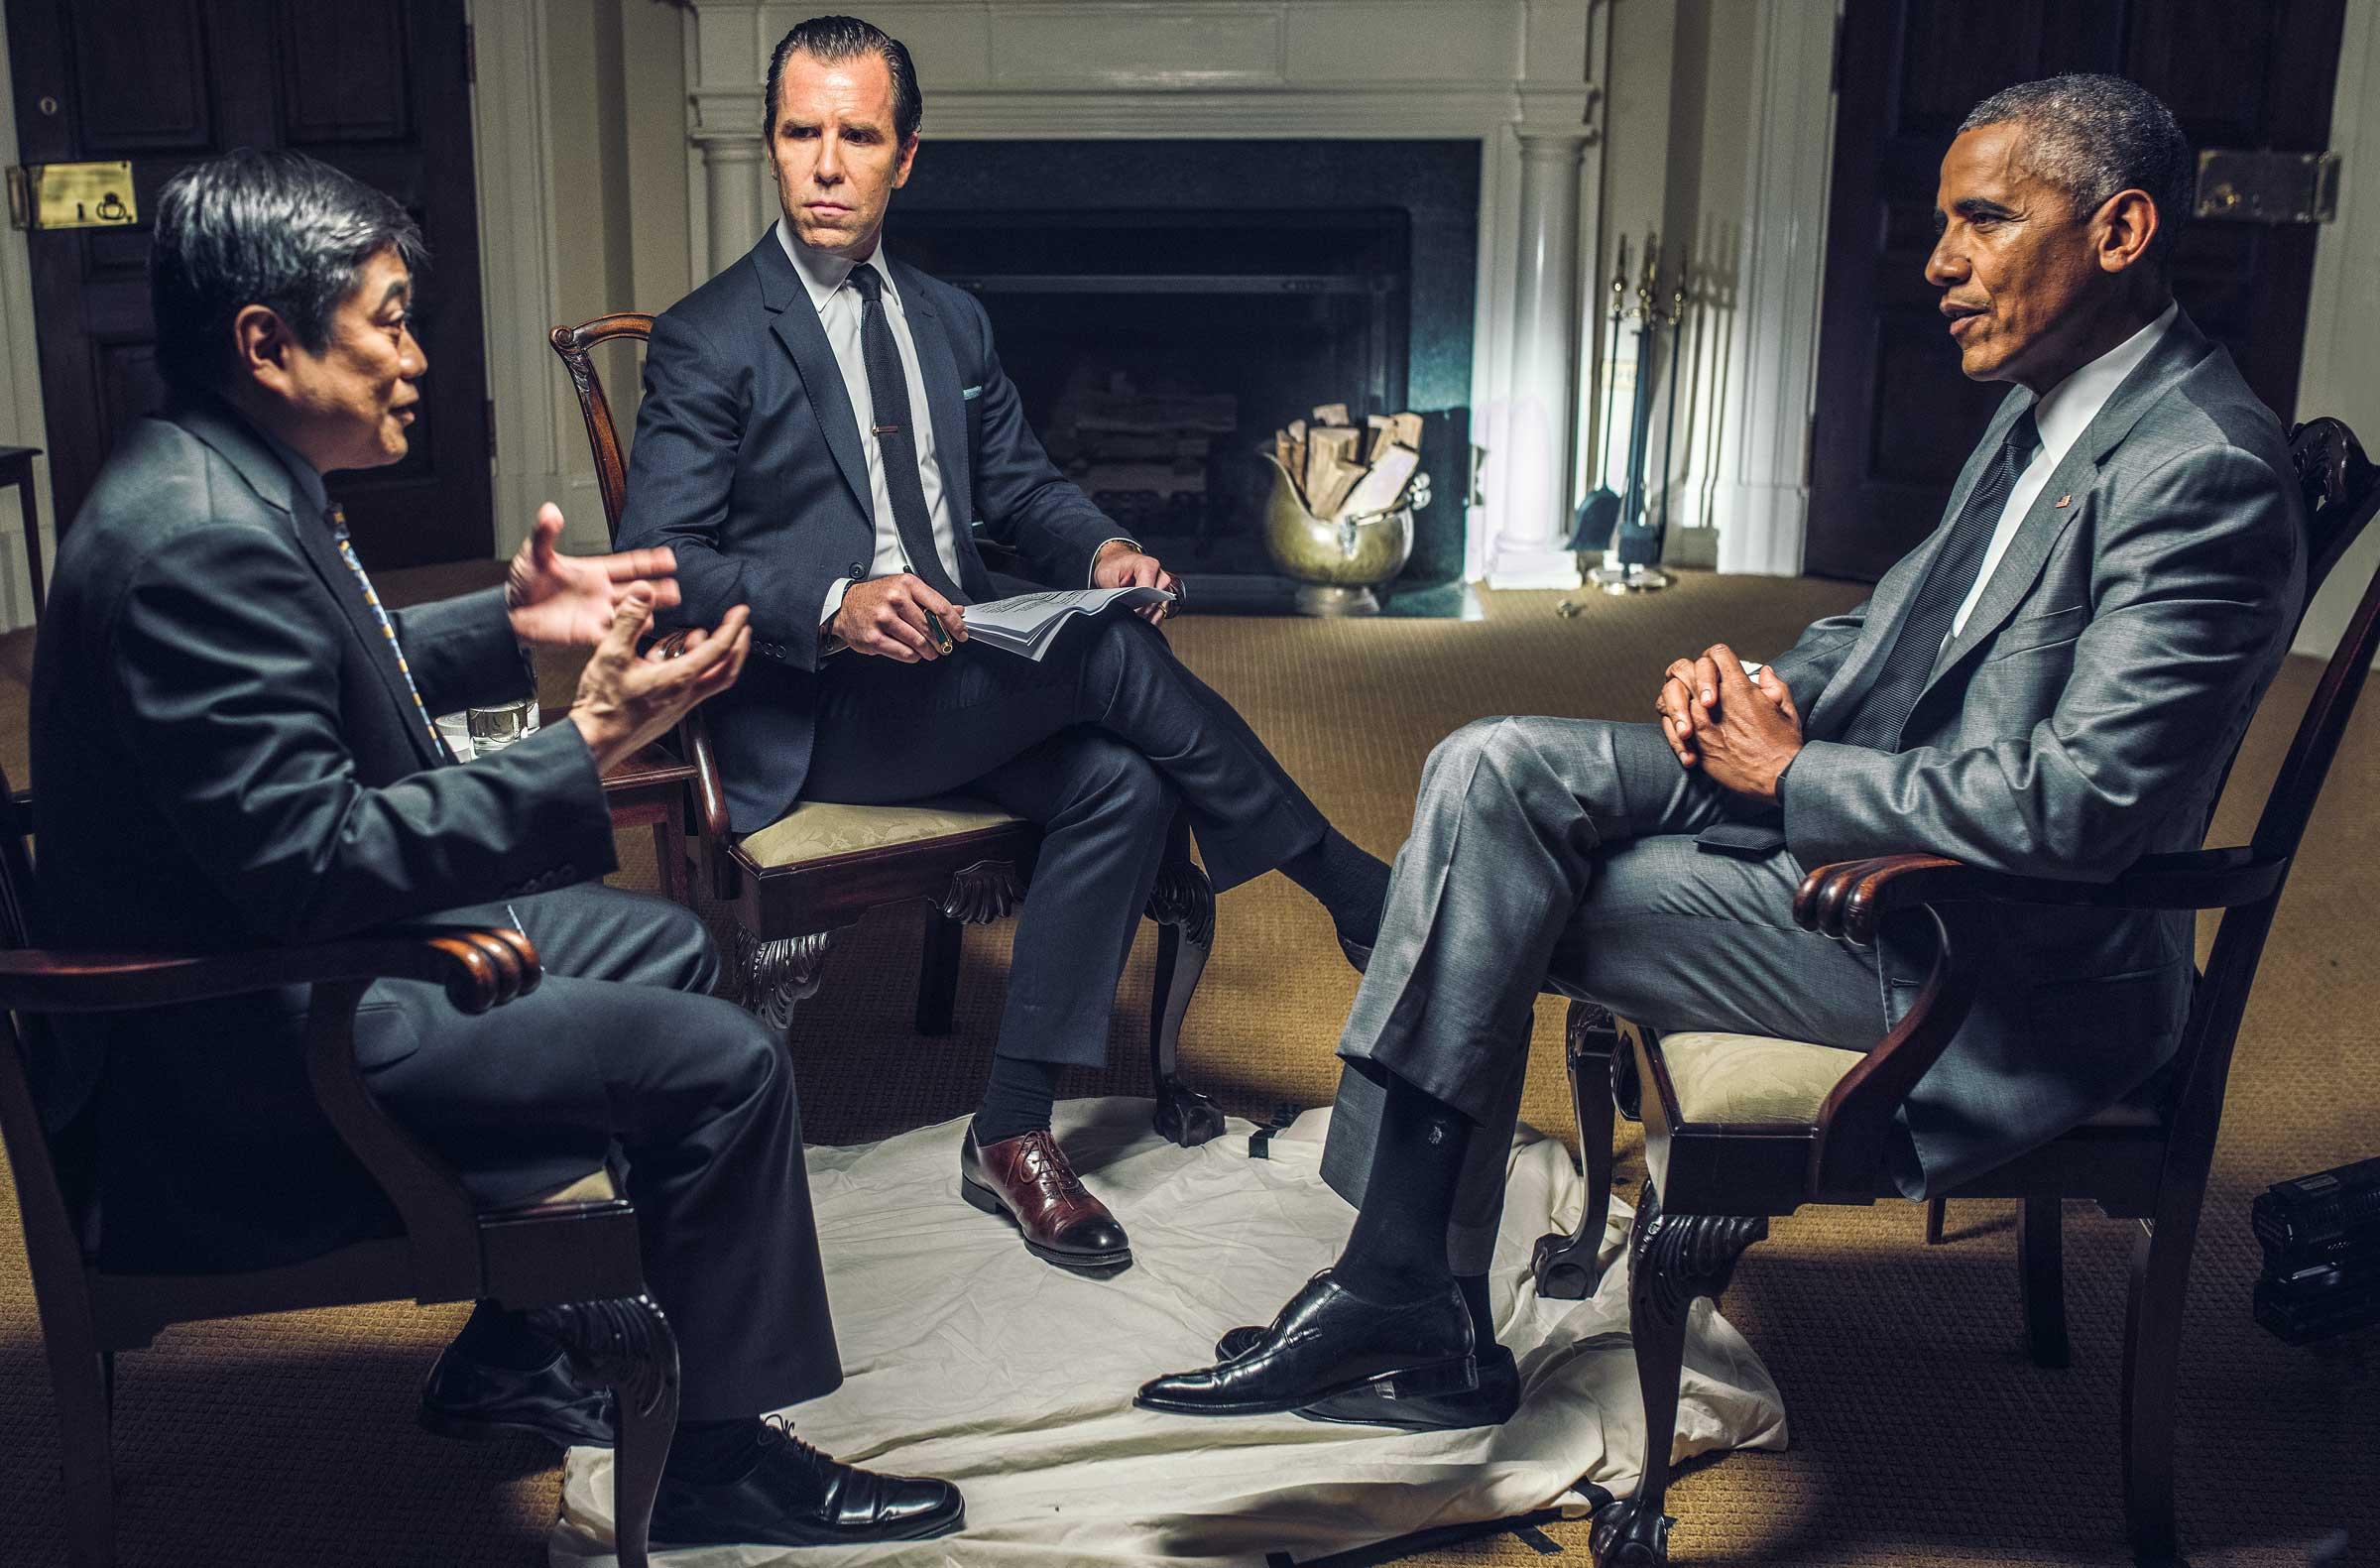 joi ito scott dadich president obama interview